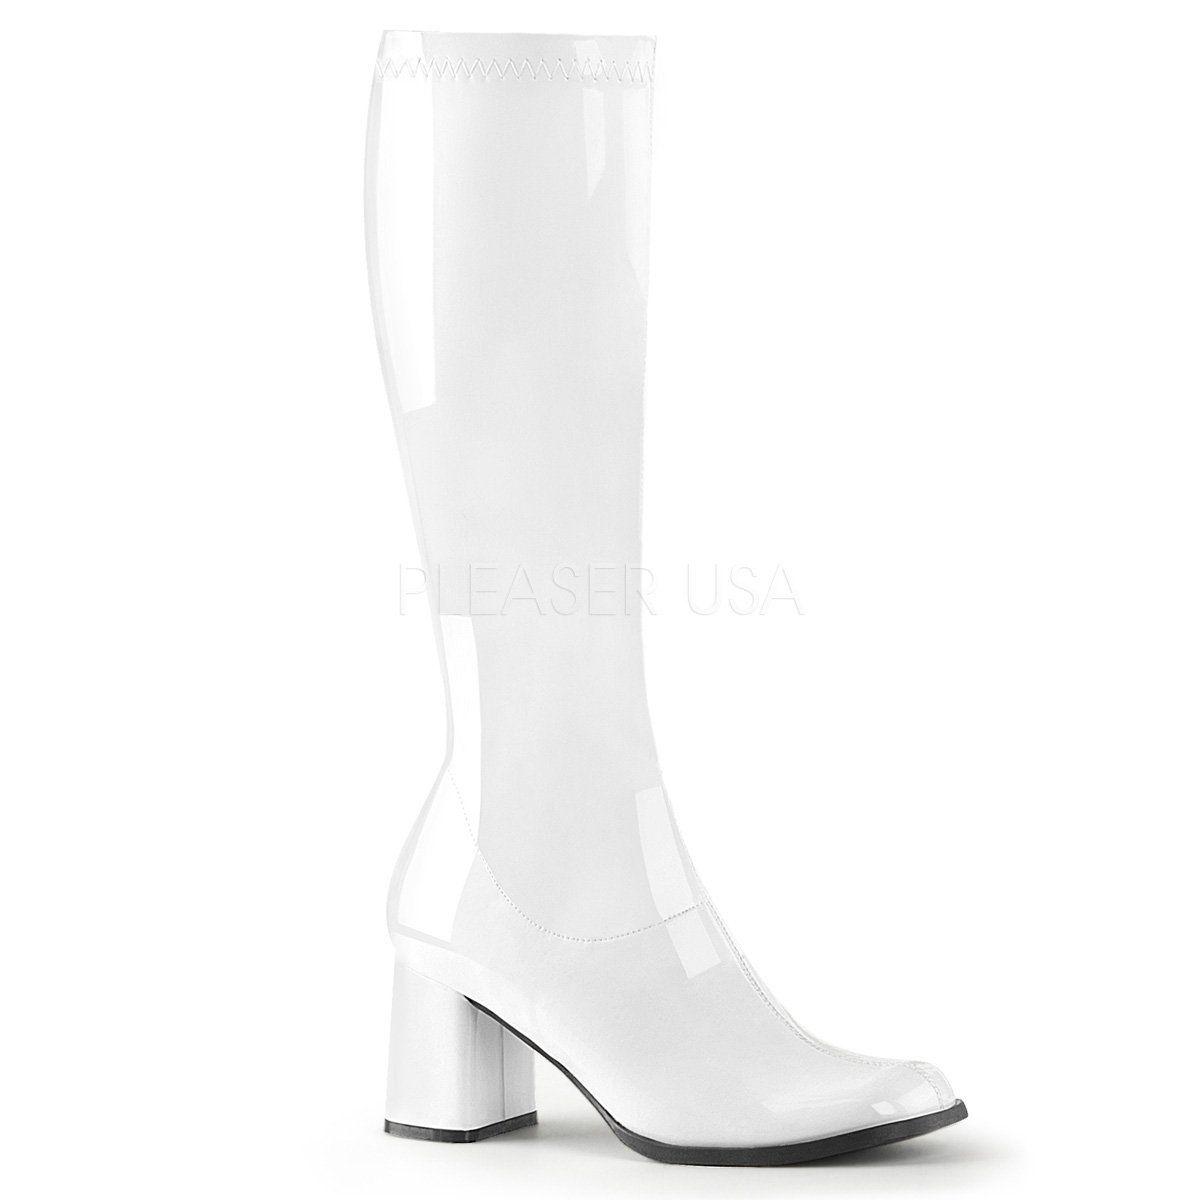 3cf256cb560 Funtasma - GOGO-300 - White Str Patent - Women's Boots in 2019 ...